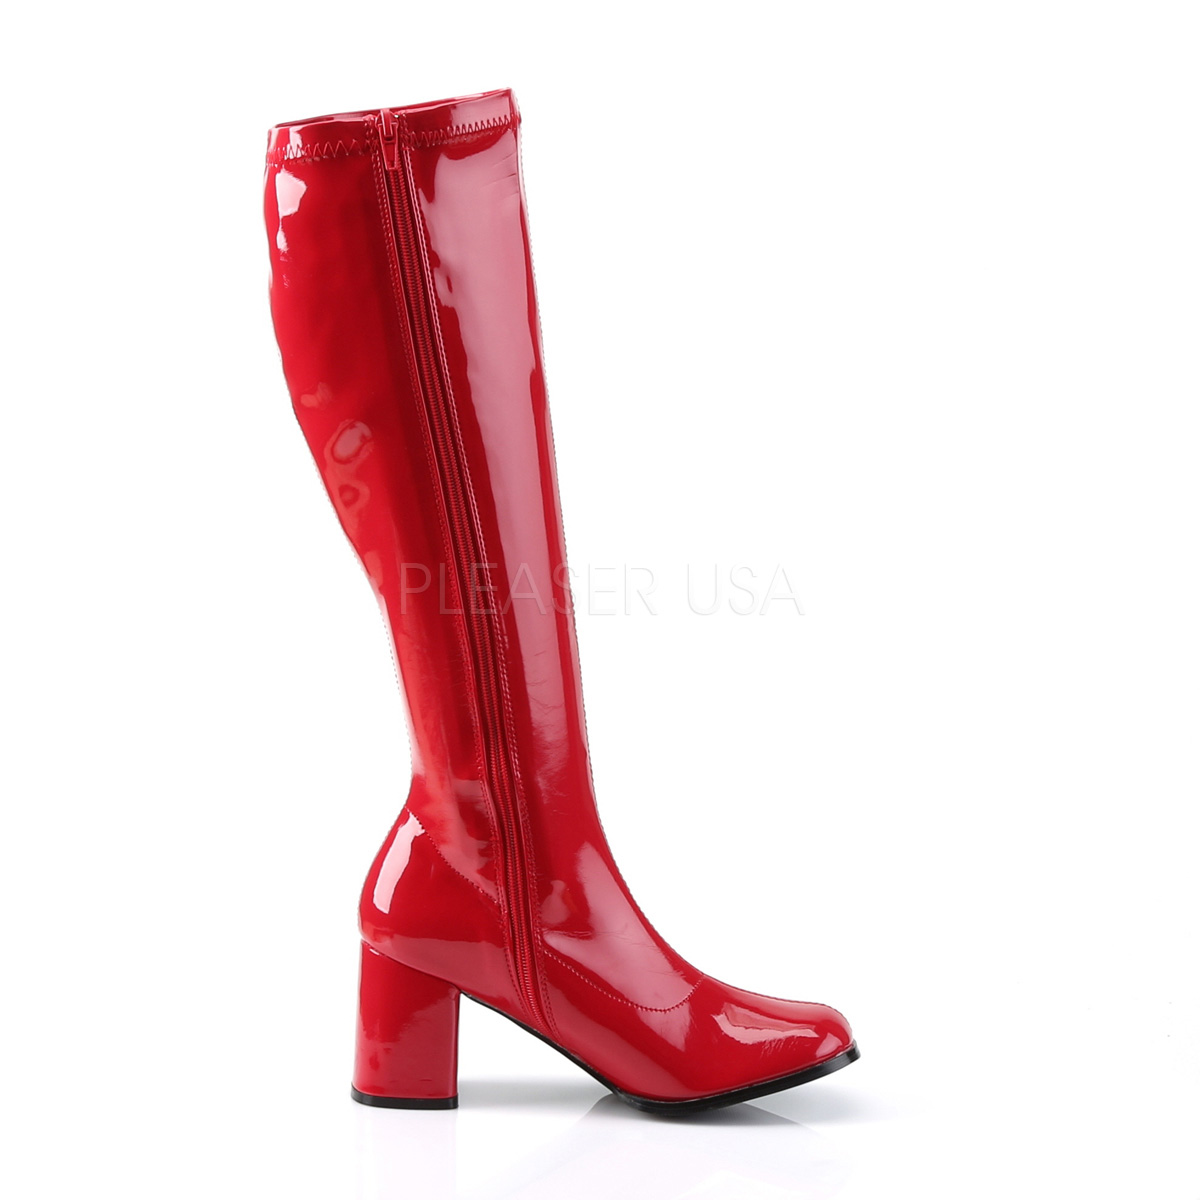 FUNTASMA(Pleaser) GOGO-300 赤 レッド ニーハイブーツ GOGOブーツ コスプレ用ブーツ イベント 衣装 仮装 ハロウィン◆取り寄せ